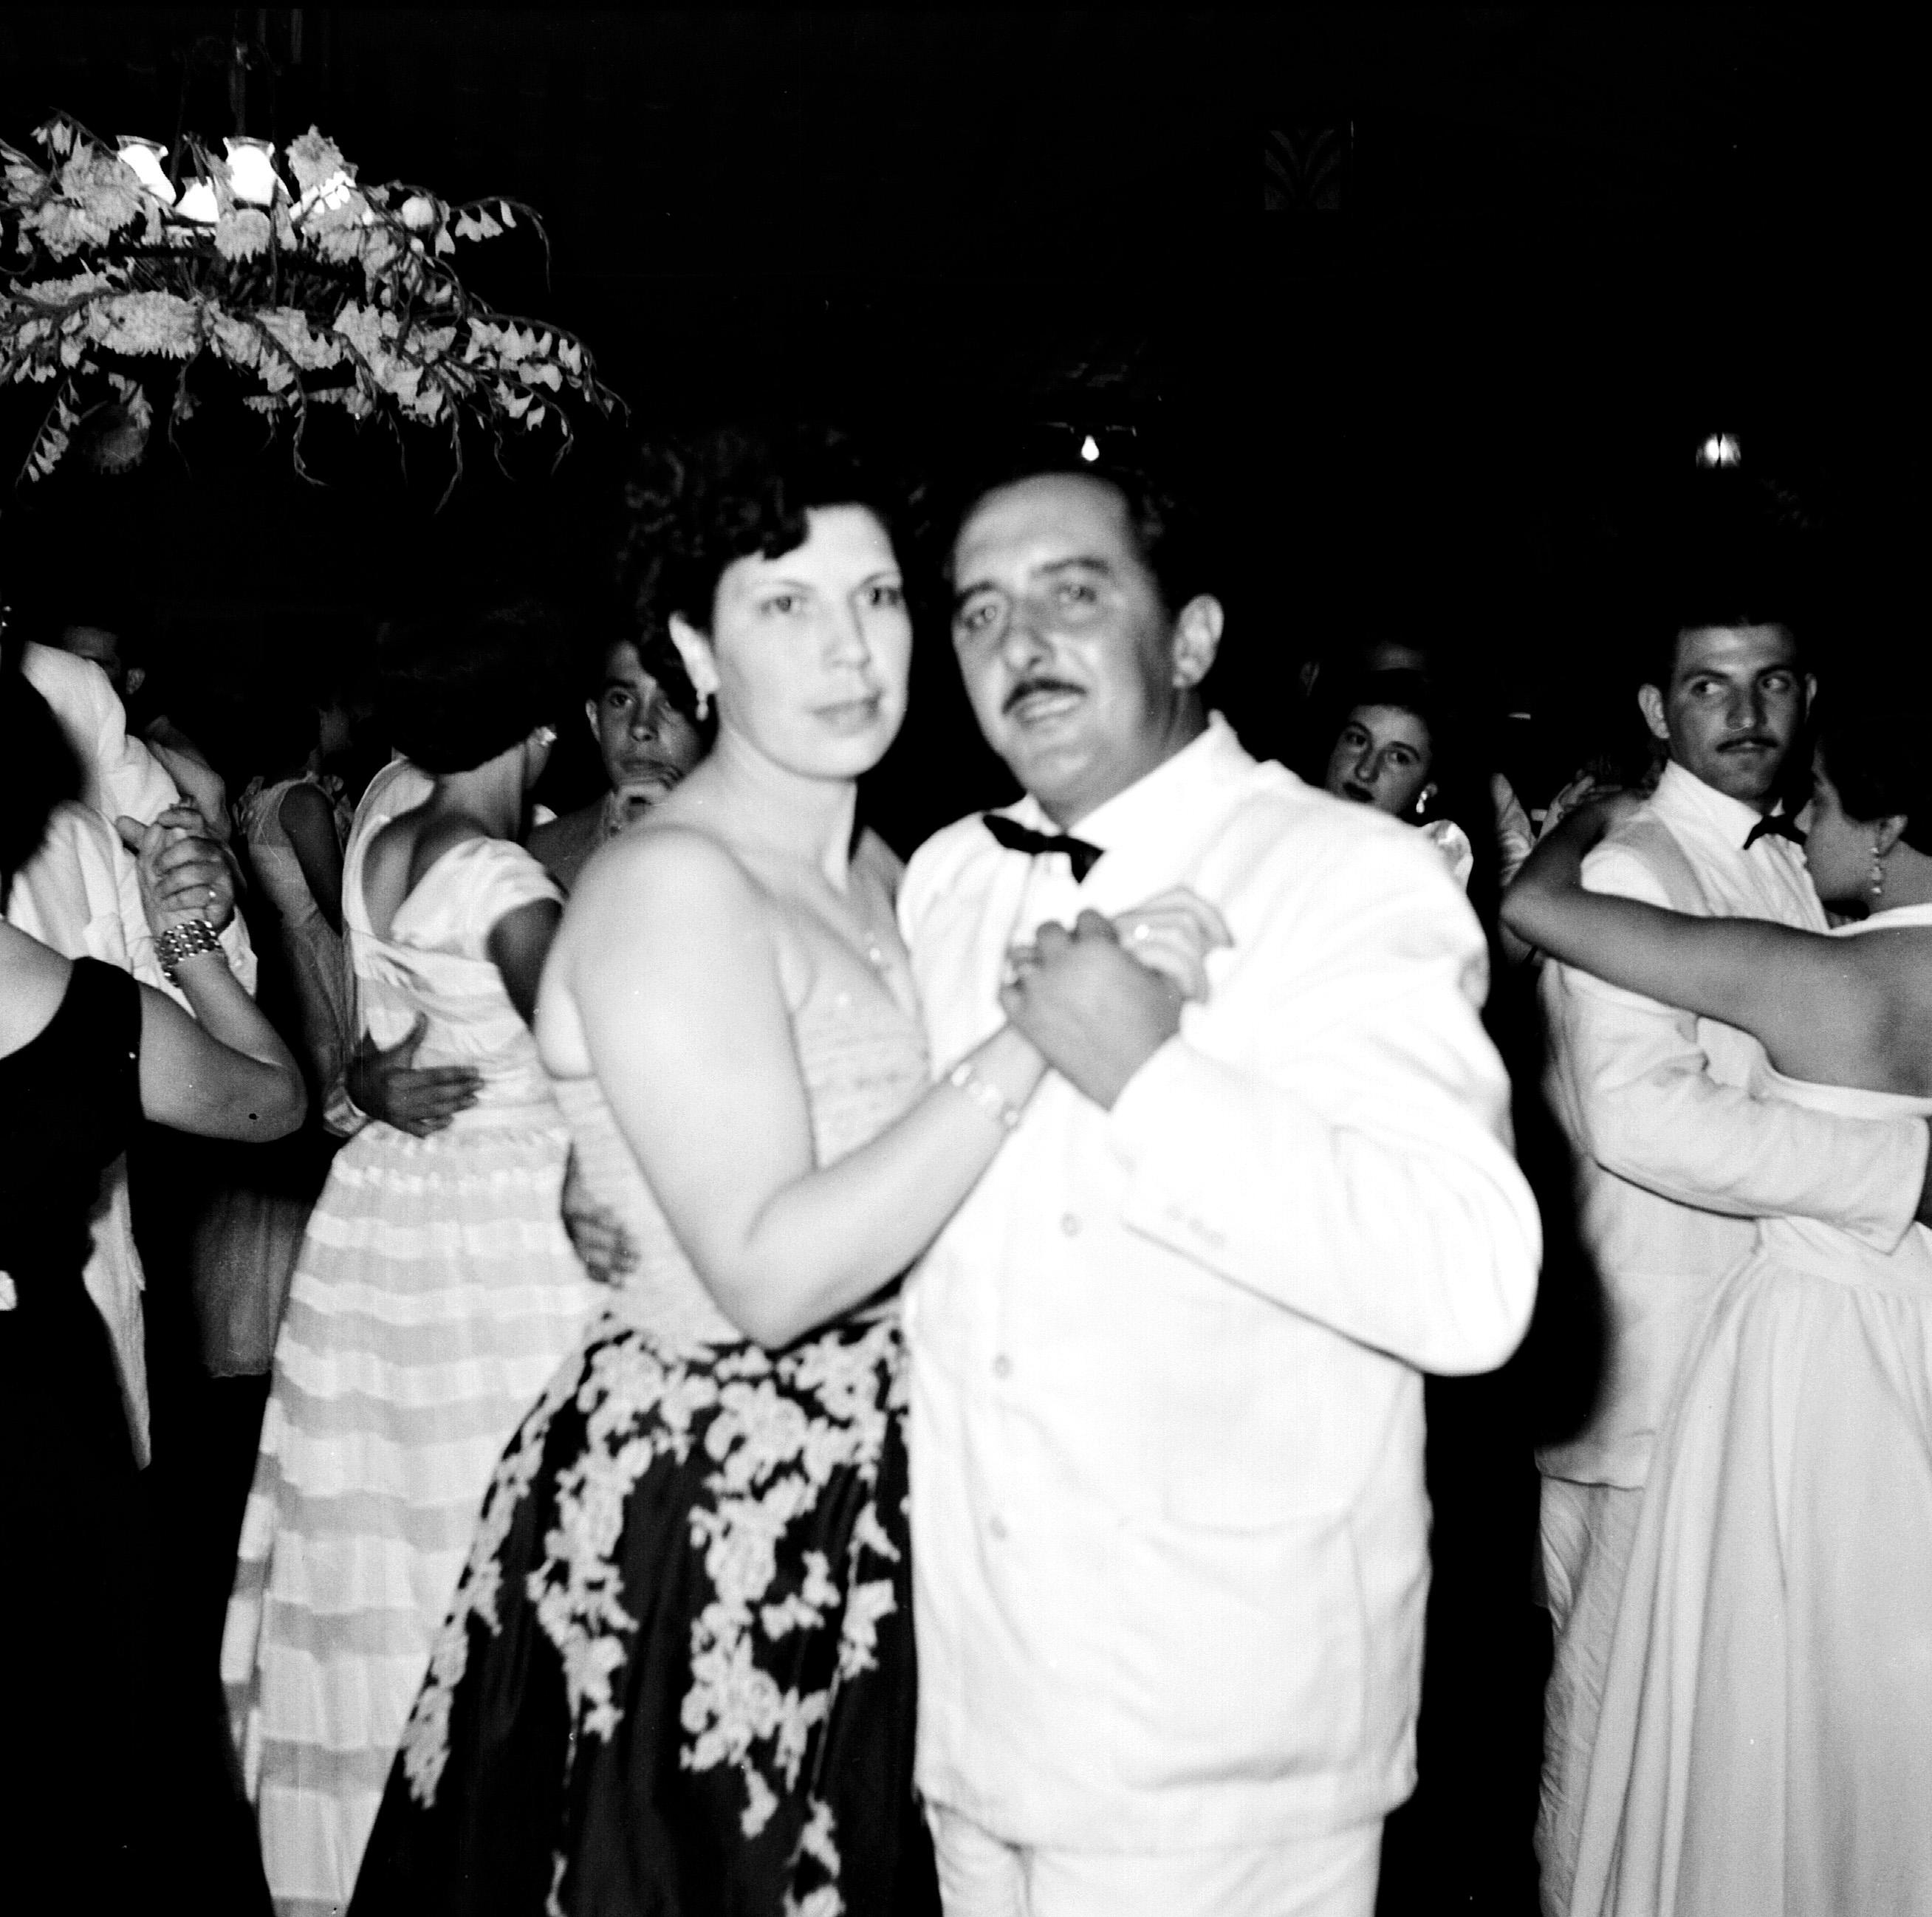 Dança do casal Dirce e Aníbal Goulart Maia - 1952